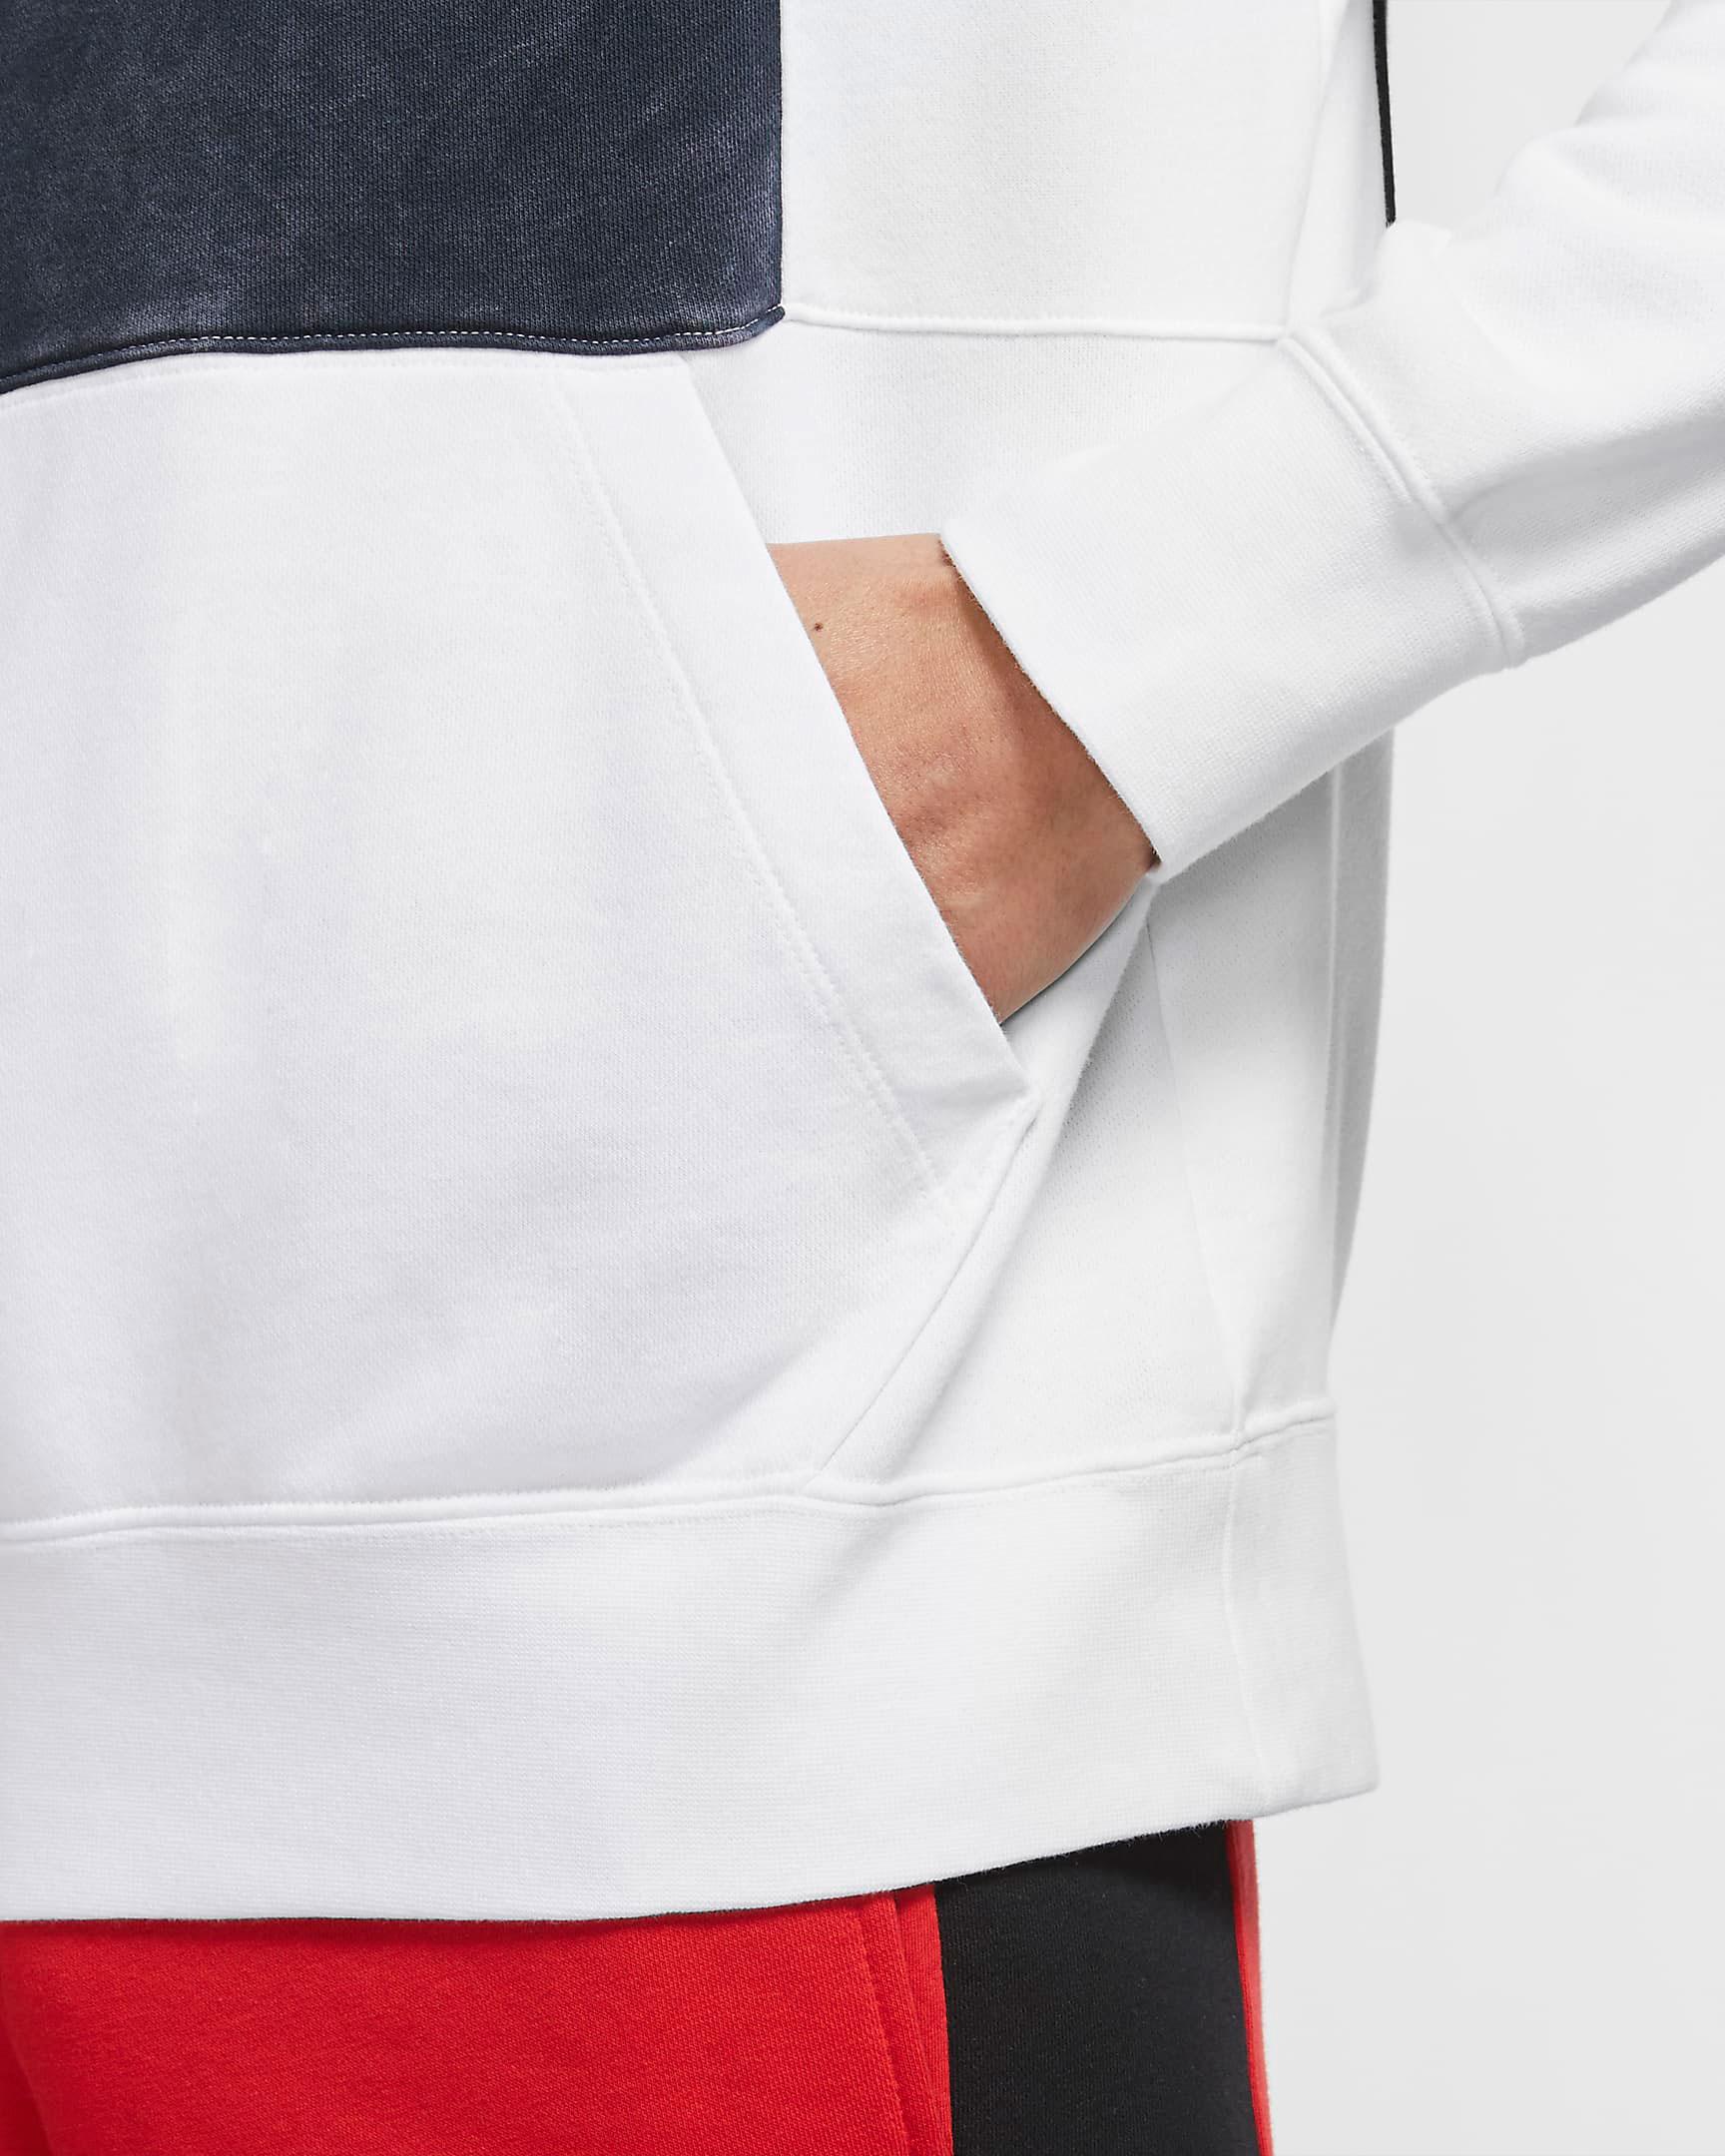 air-jordan-3-denim-fire-red-japan-matching-hoodie-2